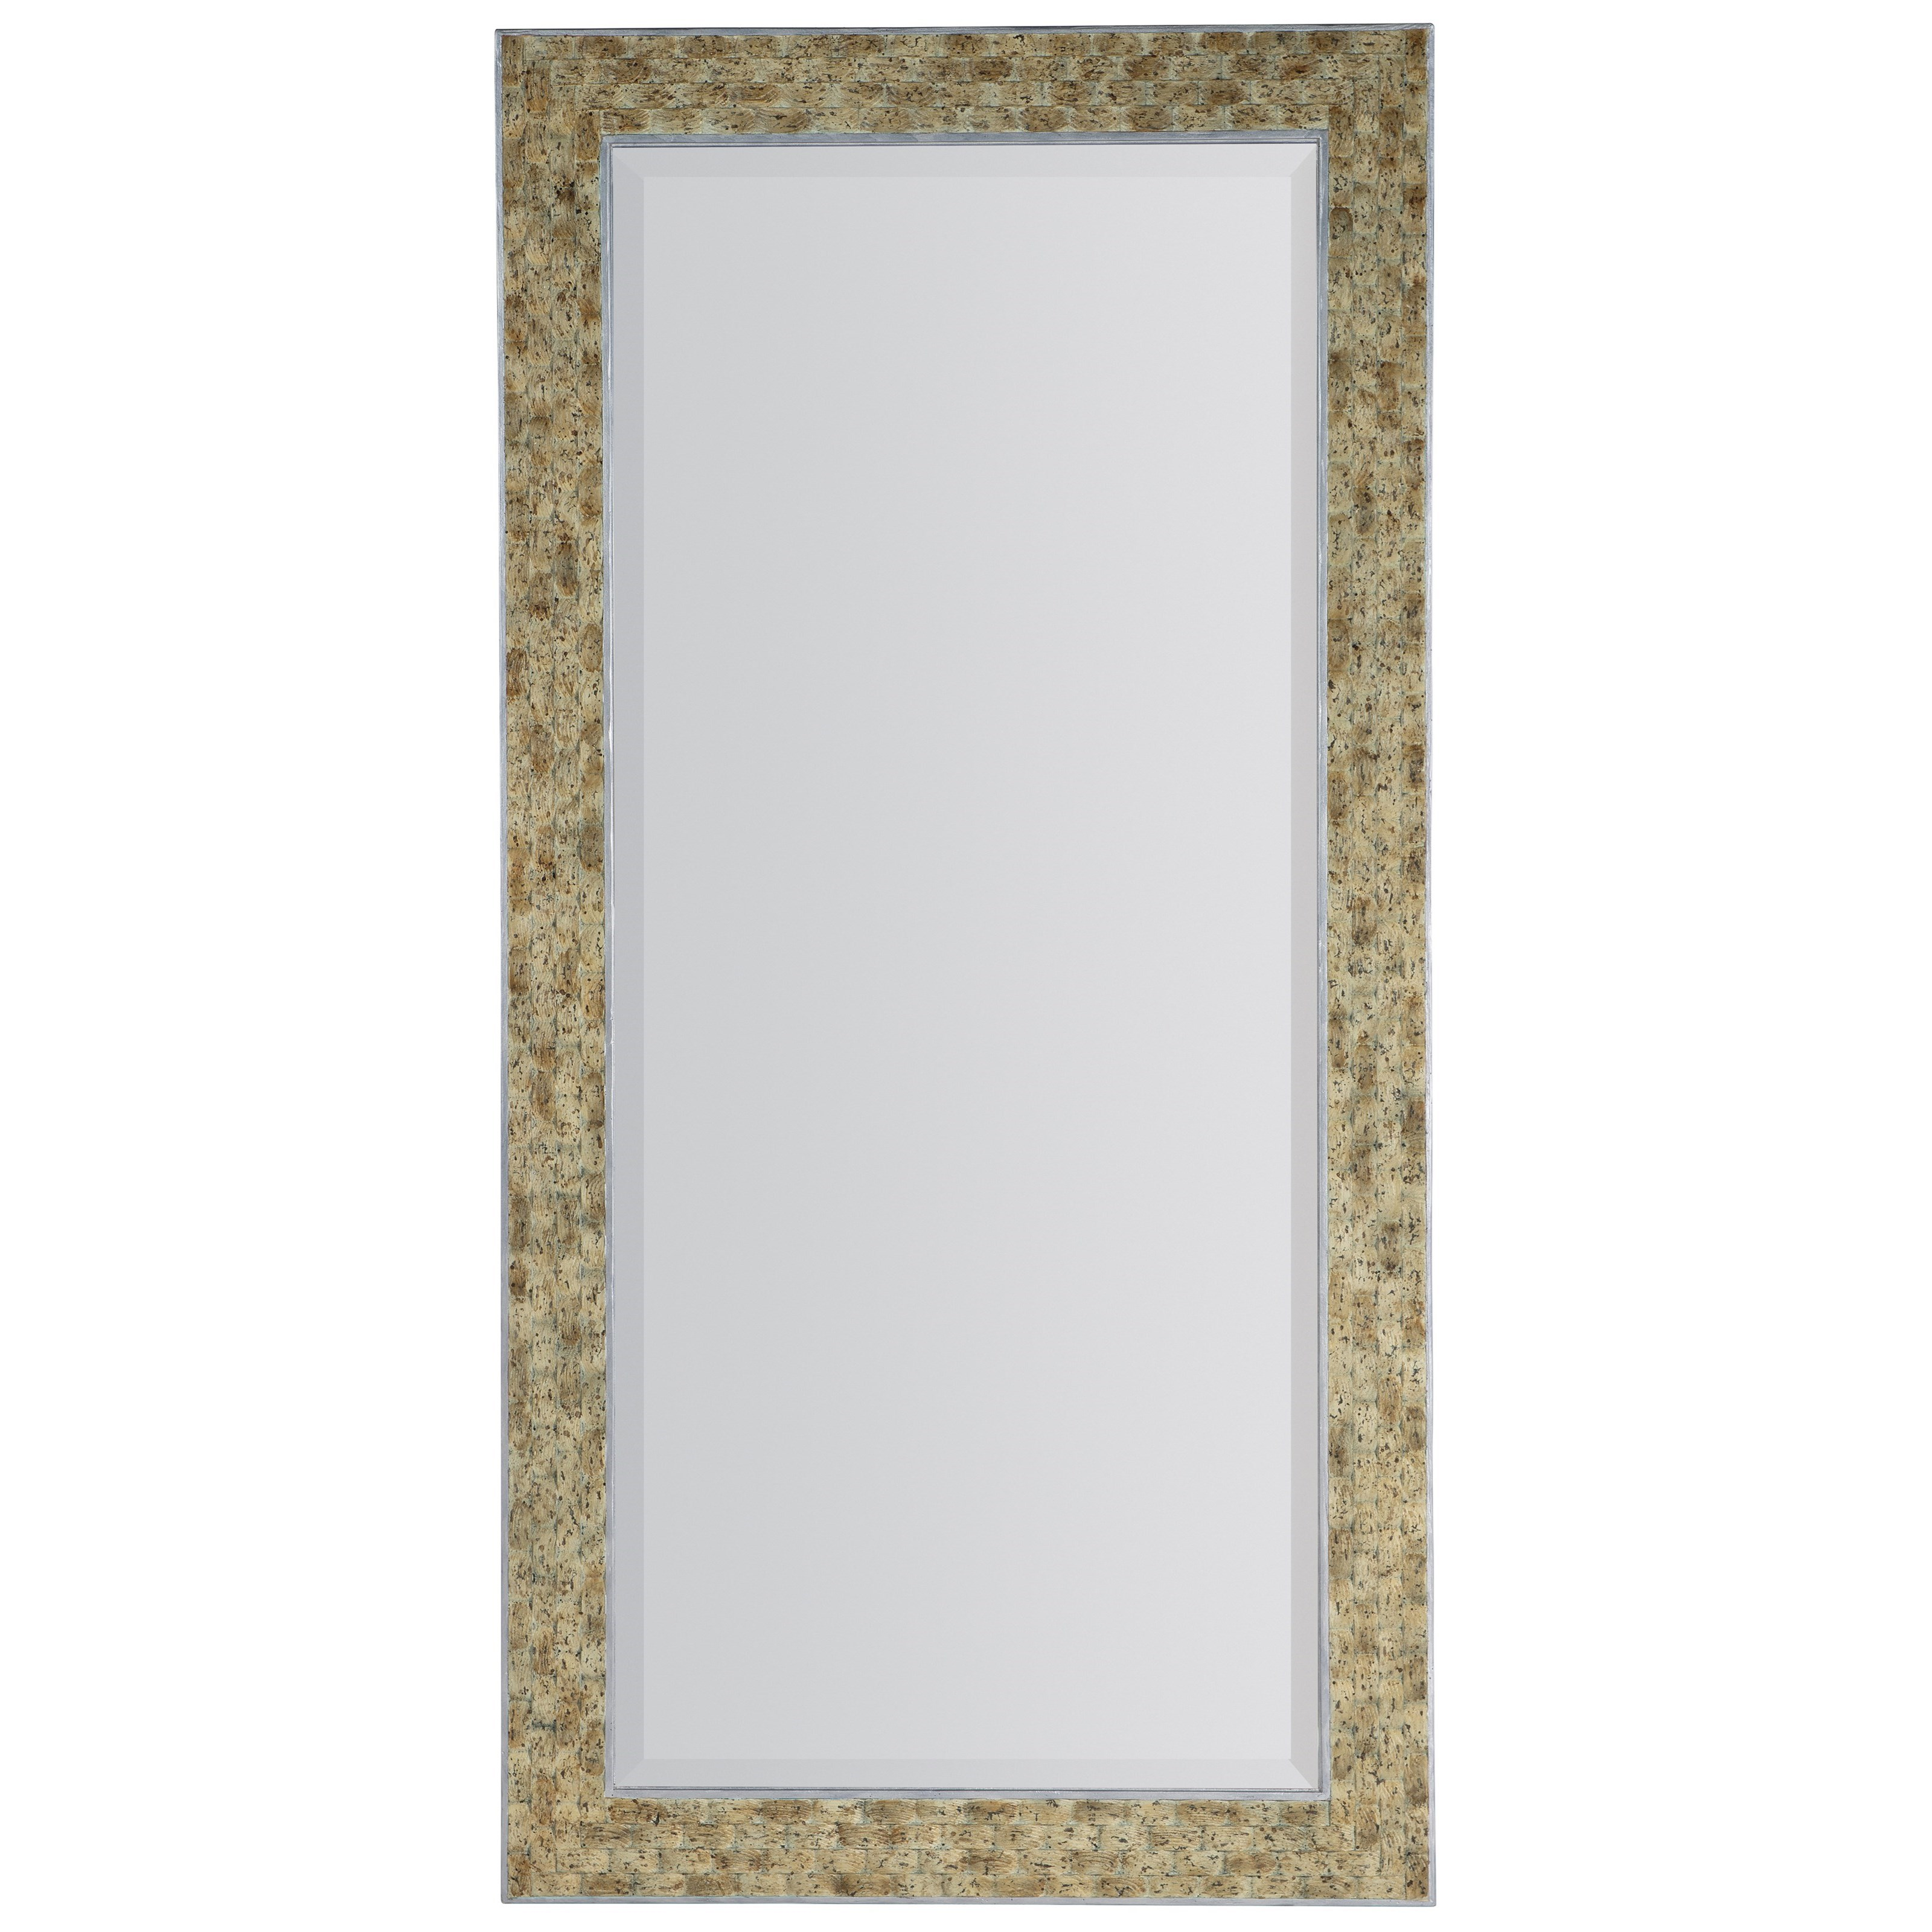 Surfrider Floor Mirror by Hooker Furniture at Baer's Furniture